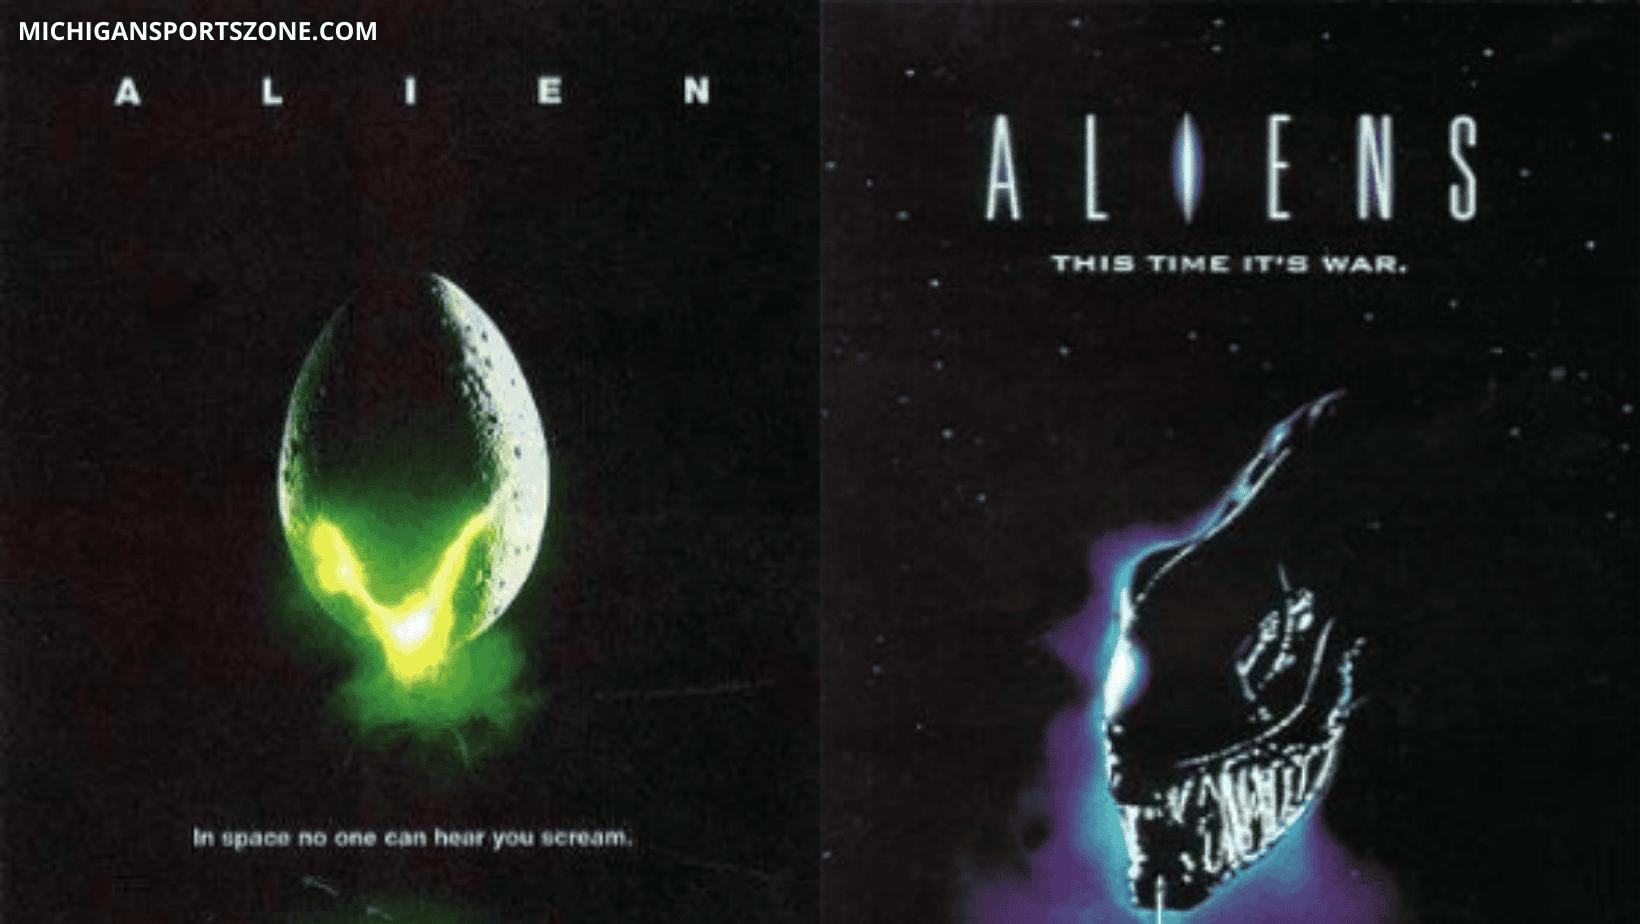 Alien vs. Aliens